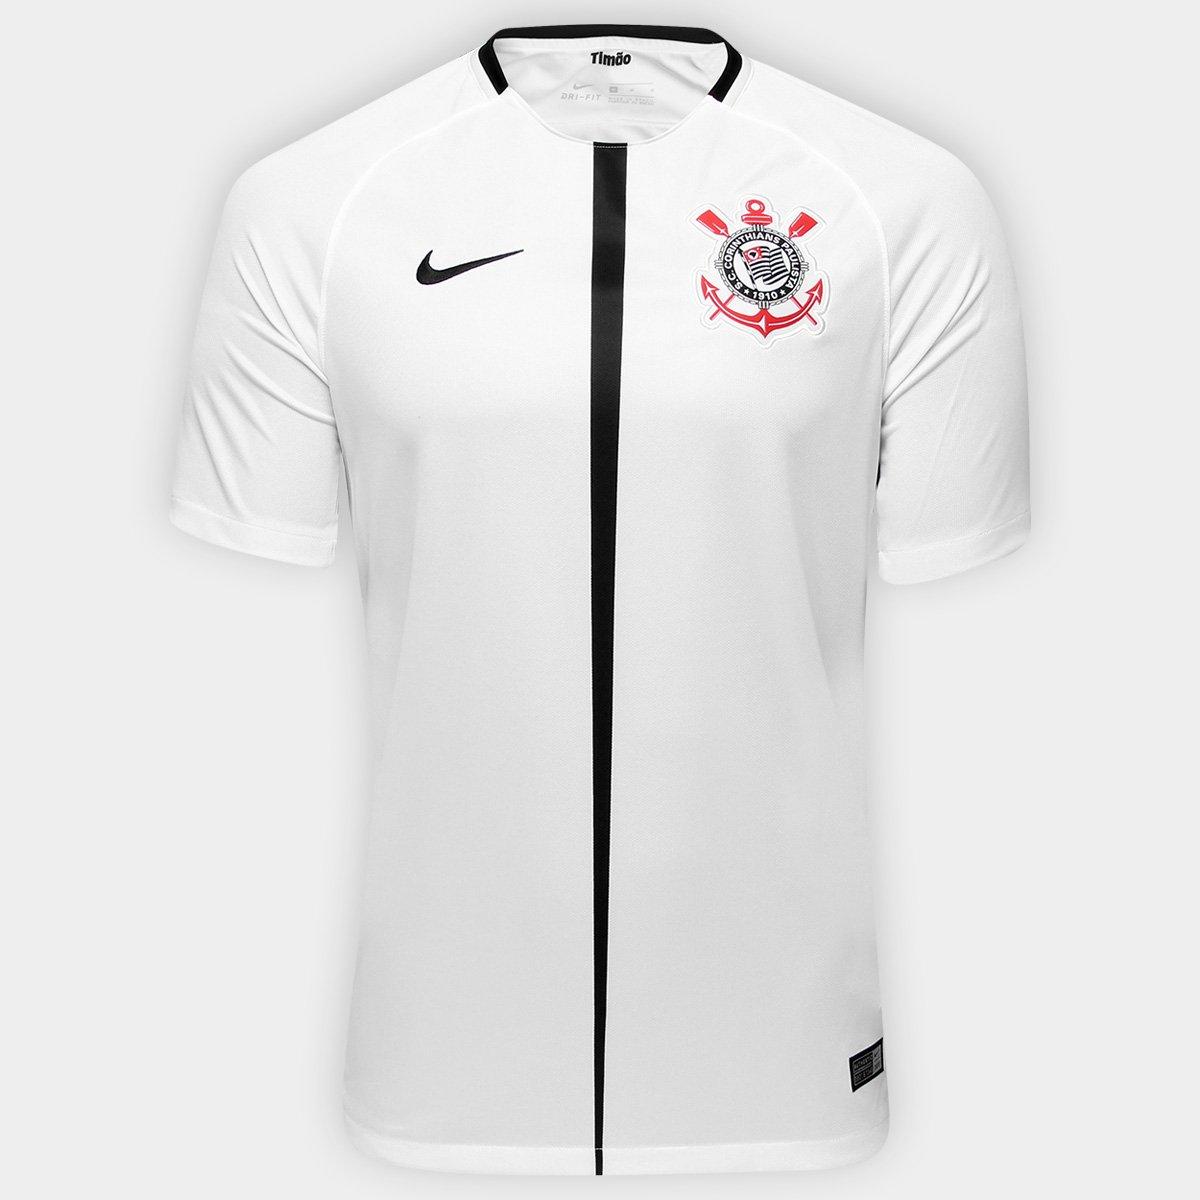 Camisa Corinthians I 17 18 s nº Torcedor Nike Masculina - Compre ... 80338a3390f10